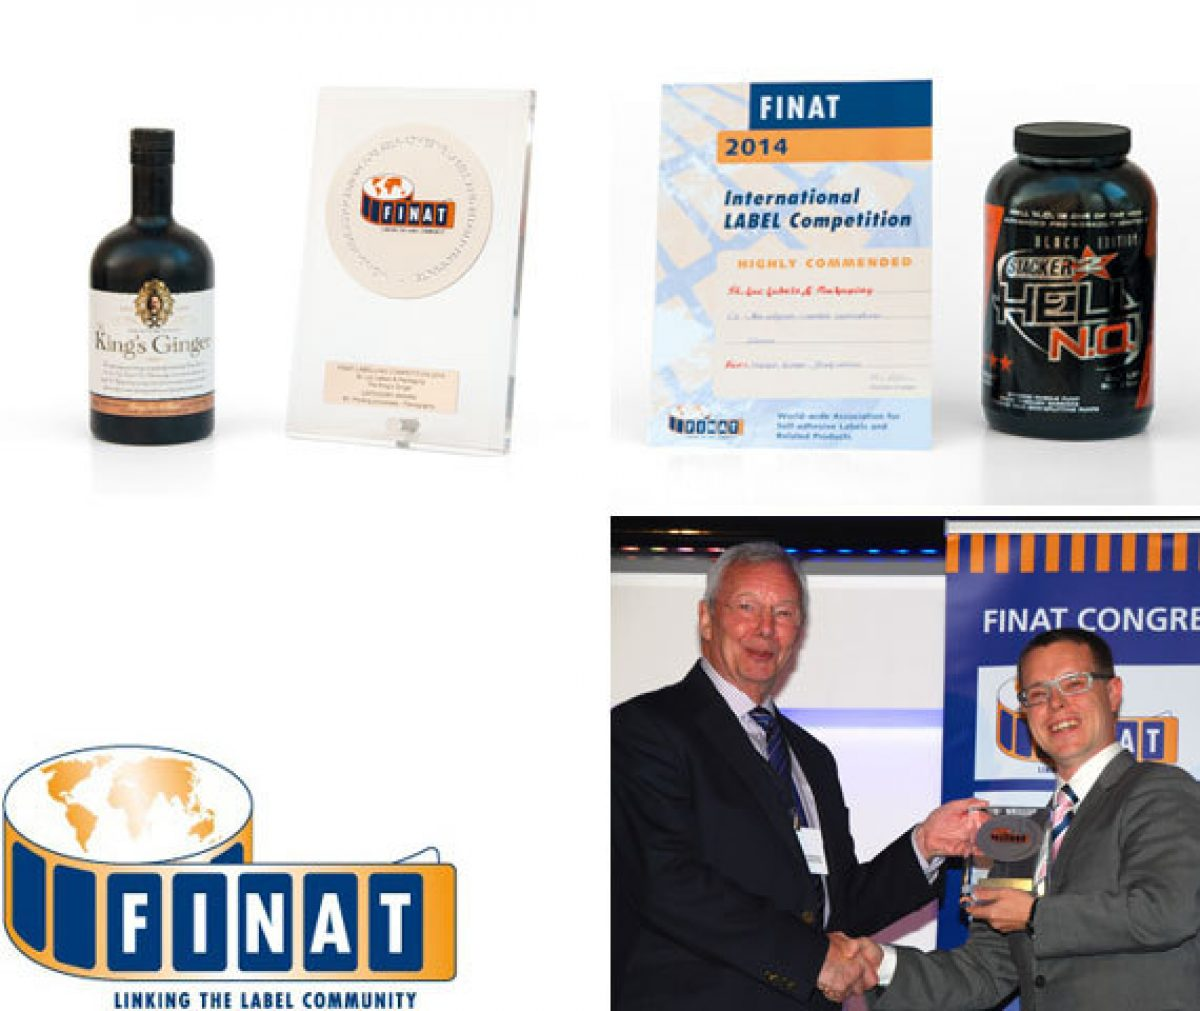 FINAT Award : St-Luc is nr 1!